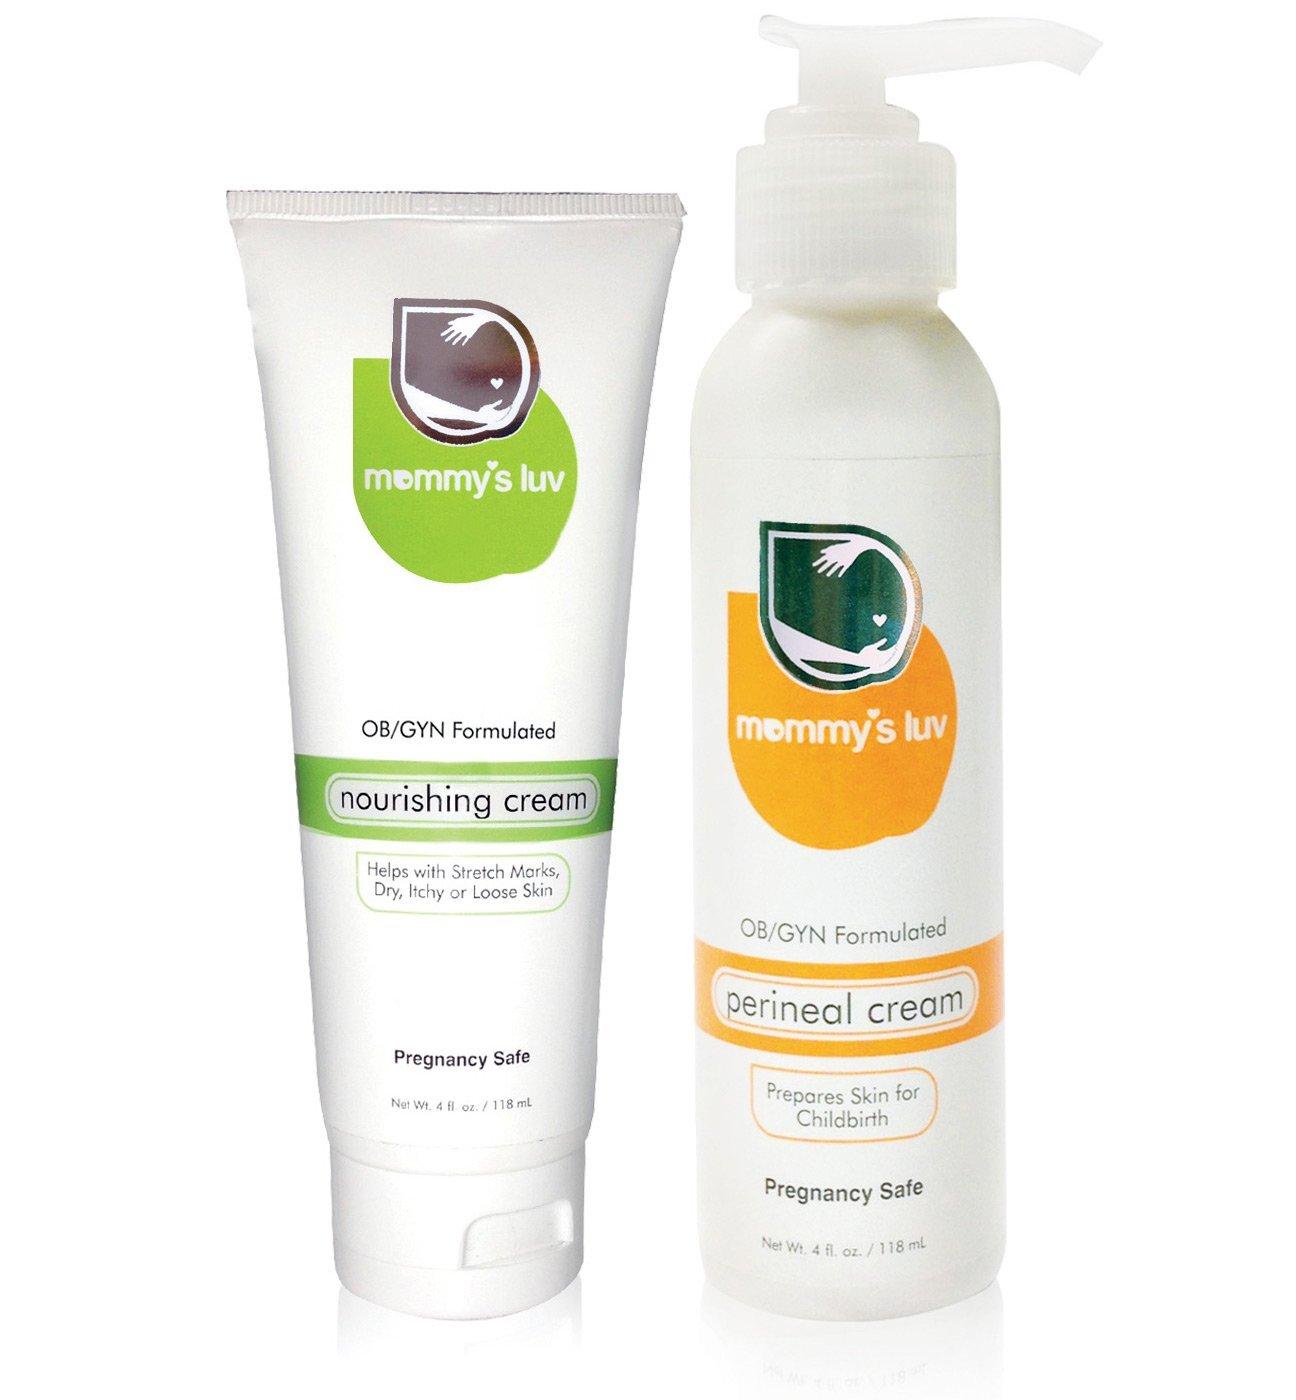 Mommy's Luv Pregnancy Creams Set of 2